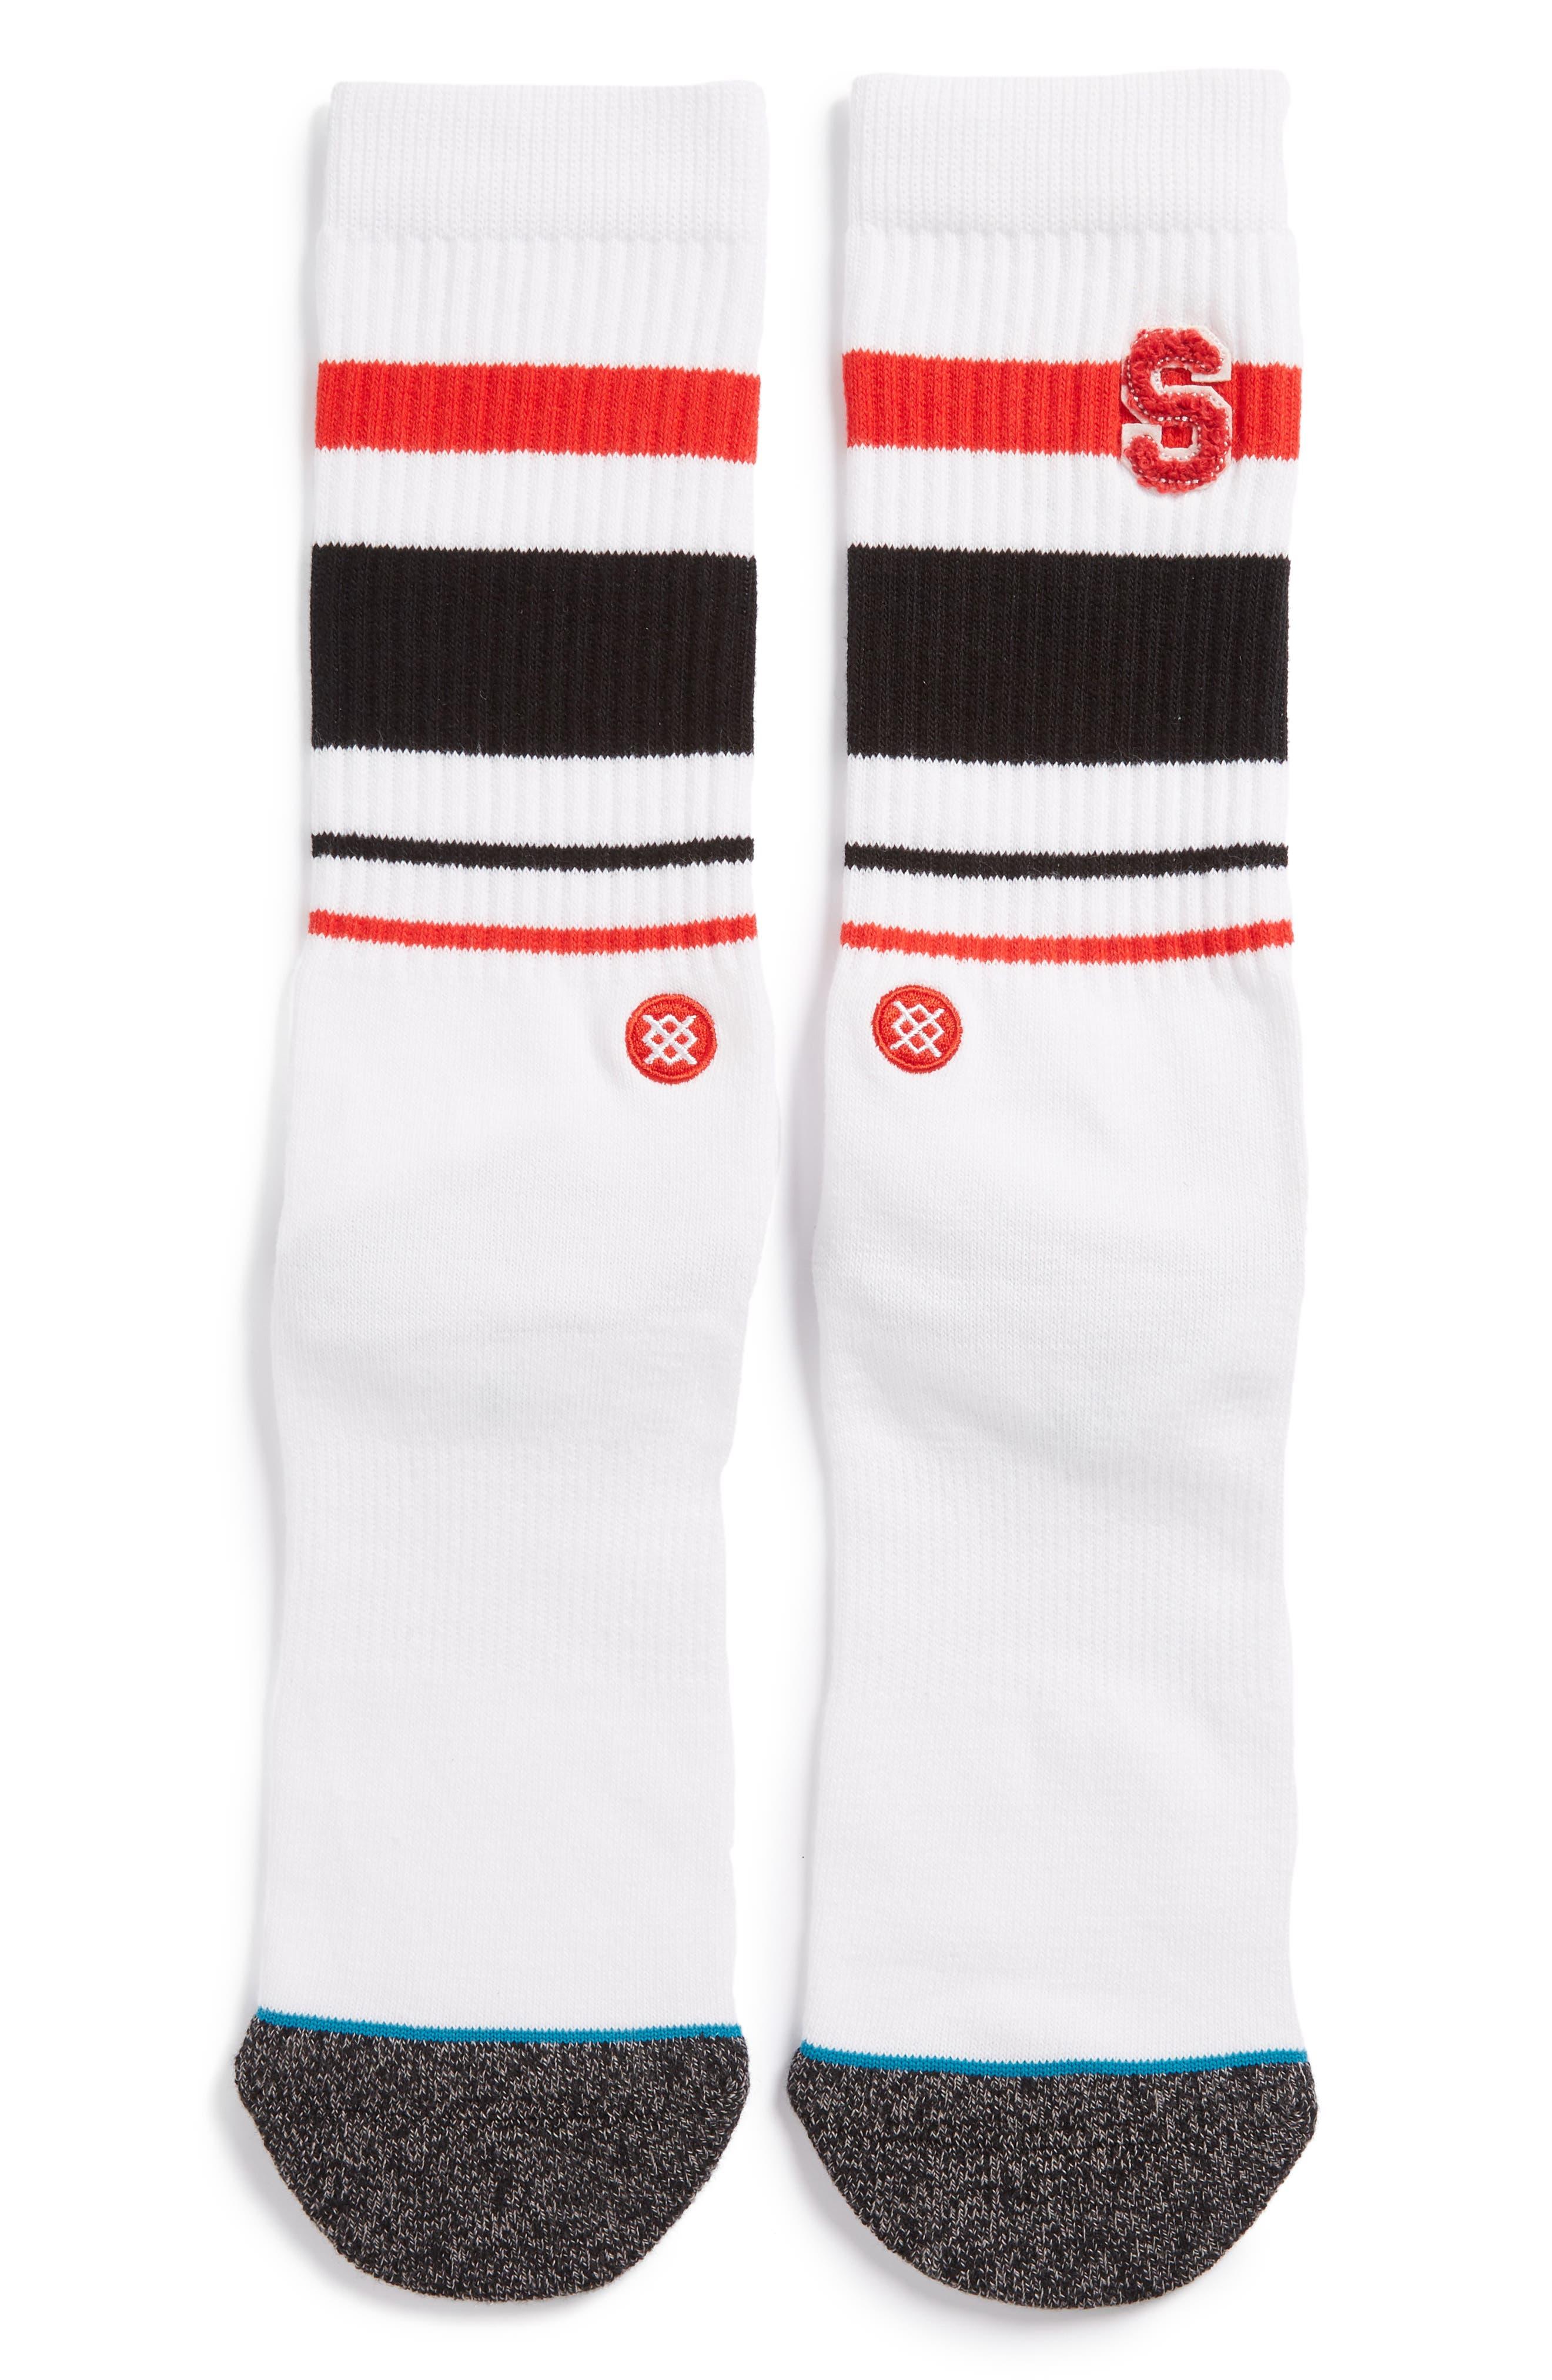 JV Crew Socks,                         Main,                         color, WHITE